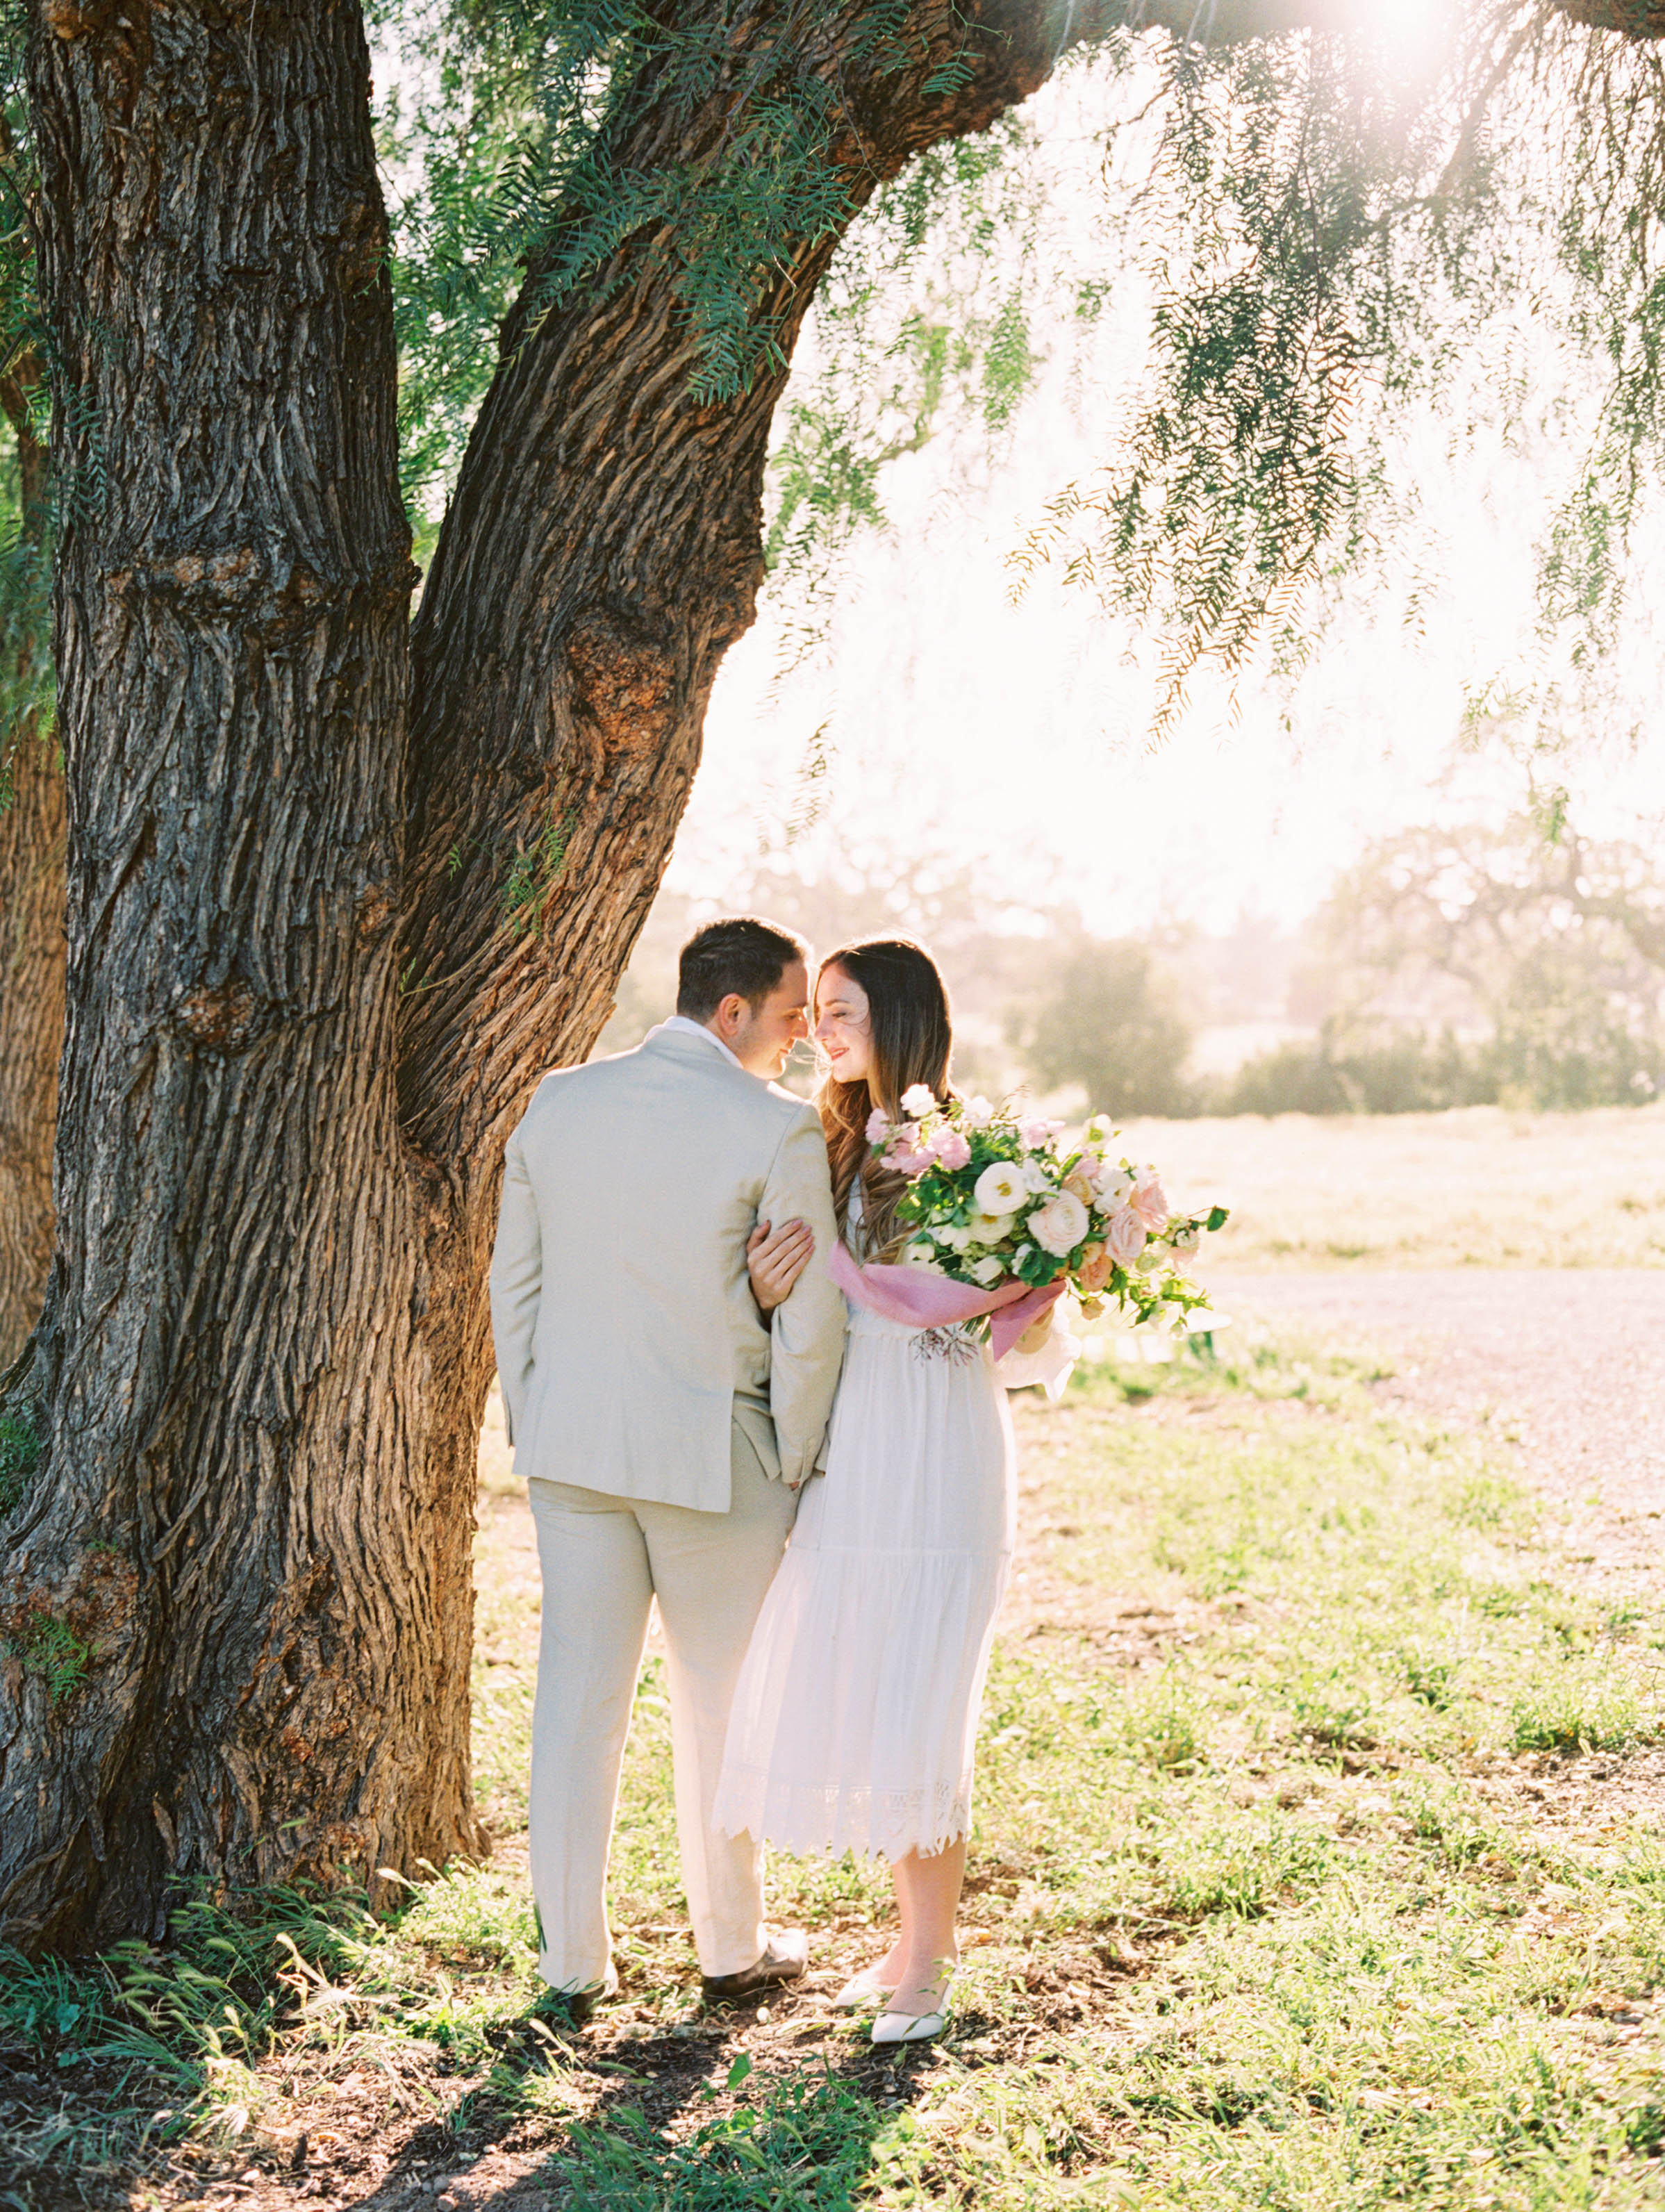 kelsandmichael_wedding_lieffranch-267.jpg